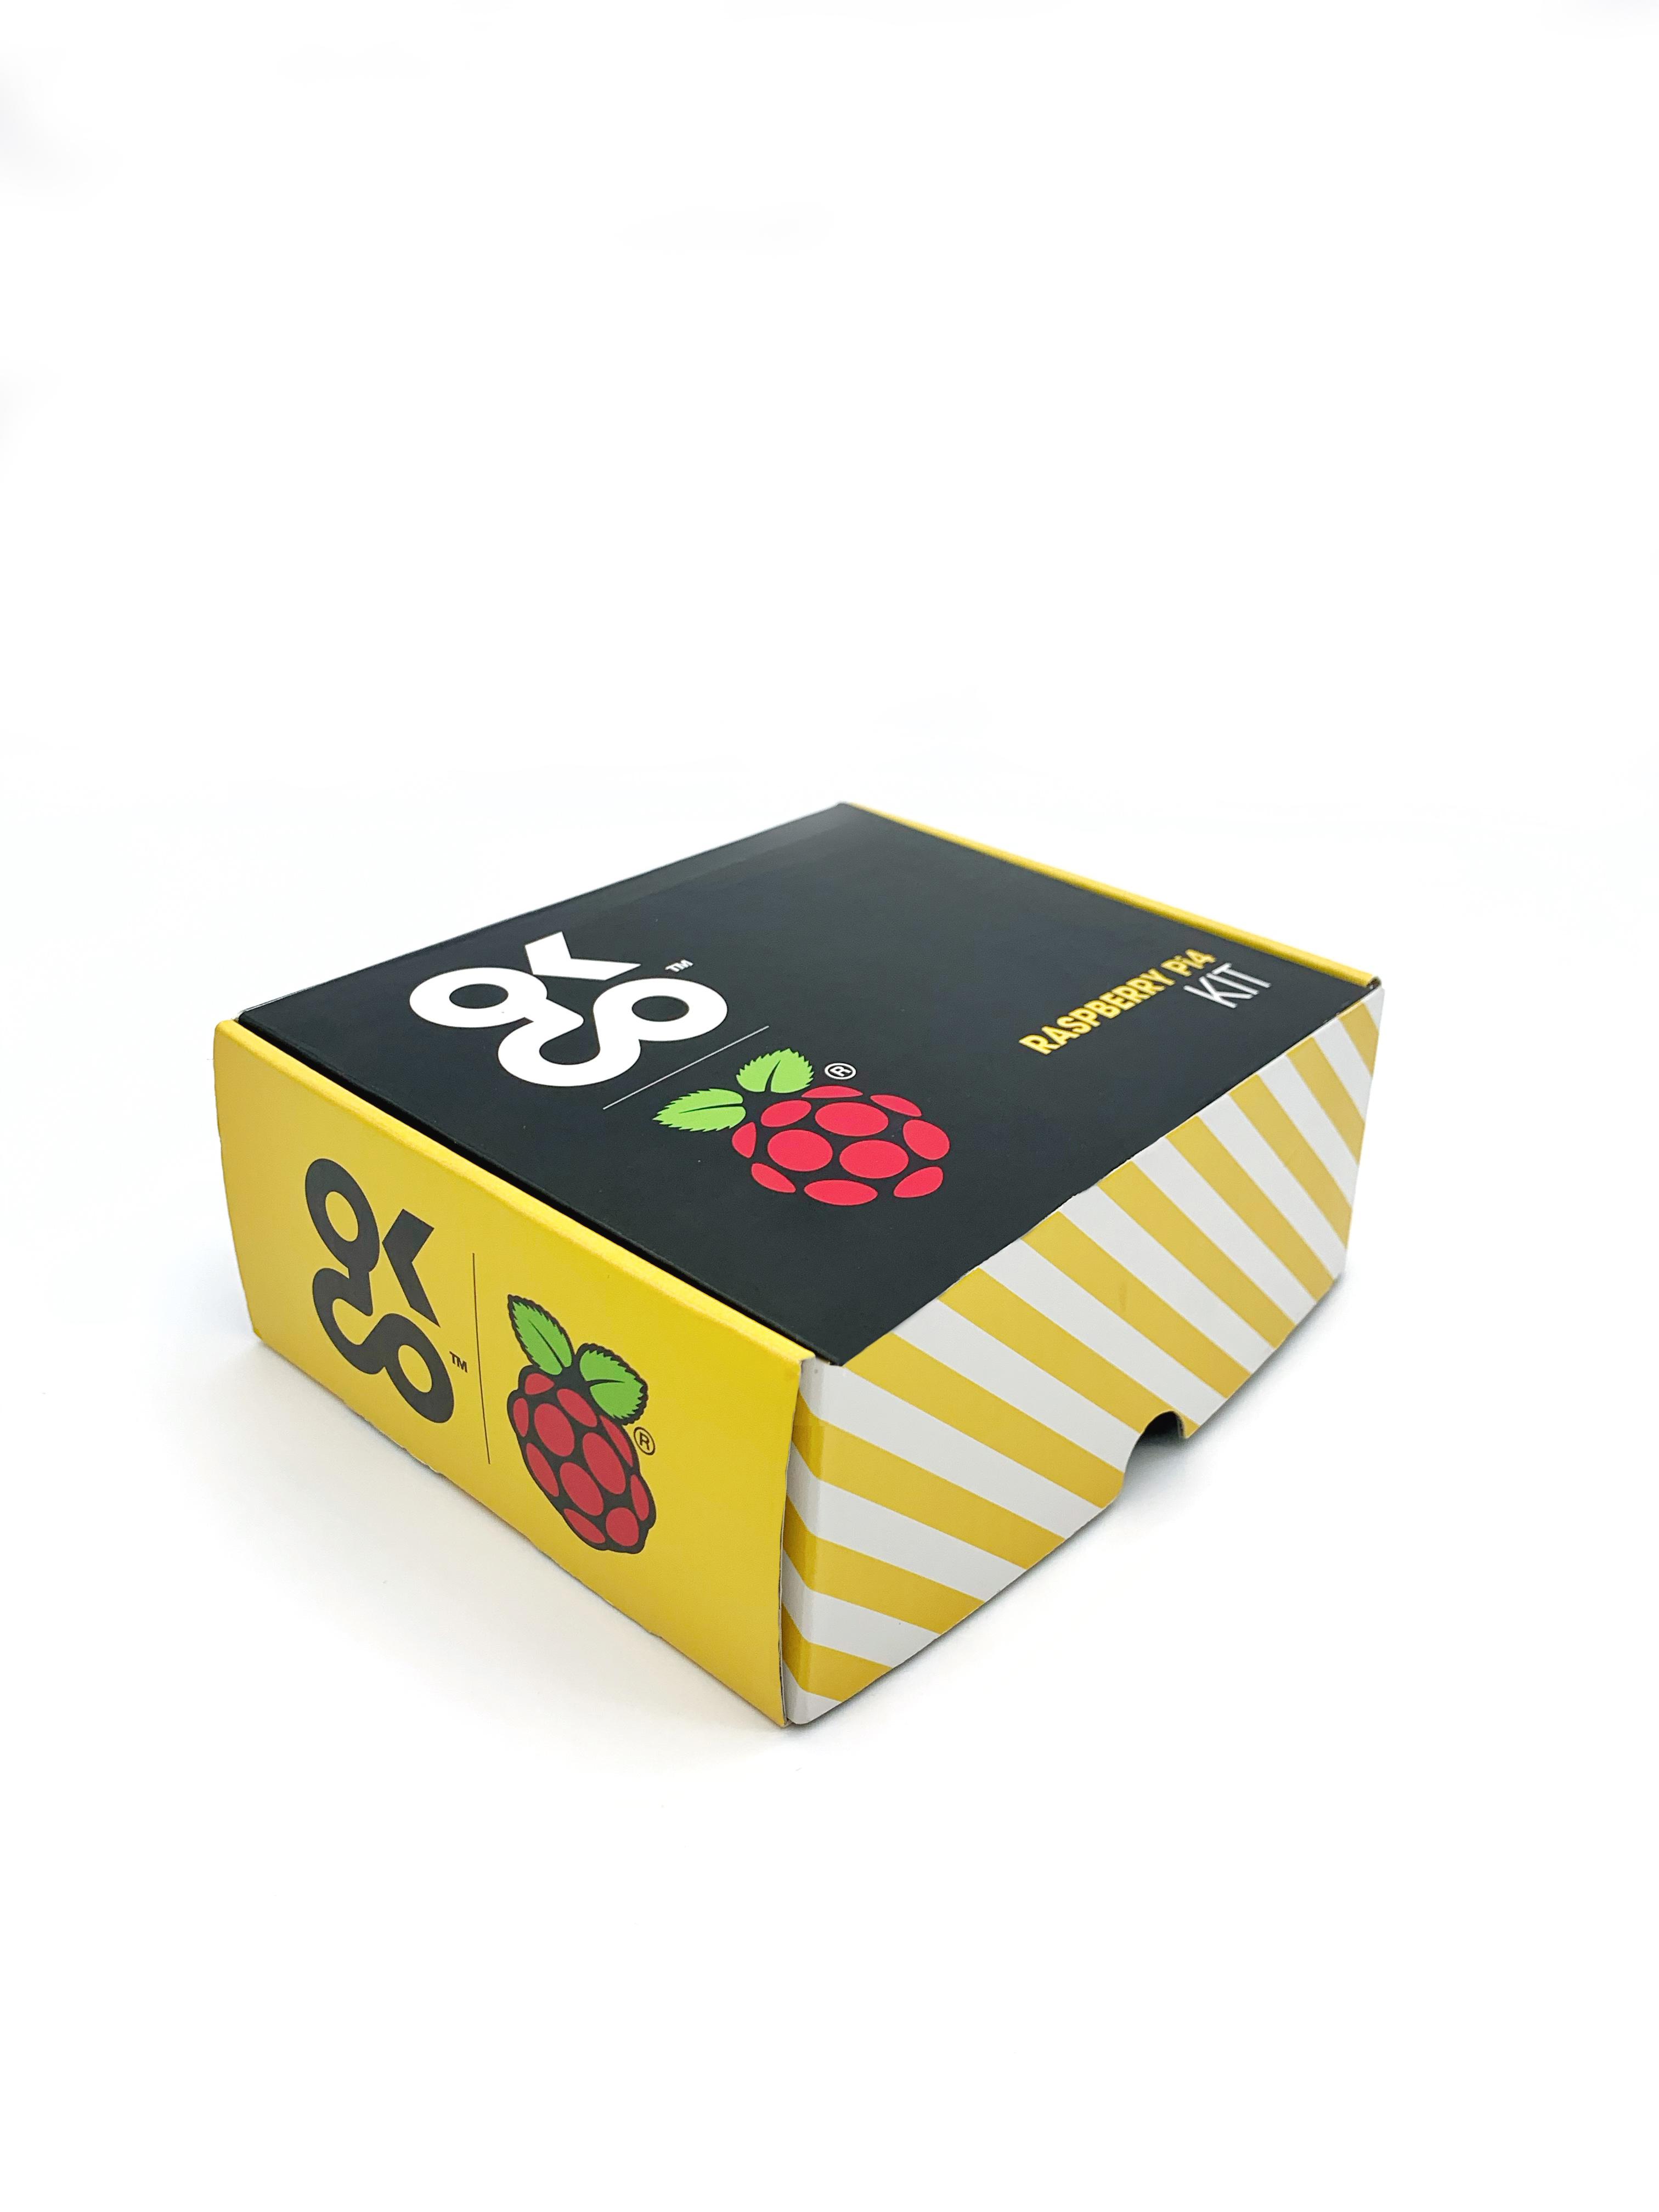 Raspberry Pi 4 Kit de base 8 Go version universelle